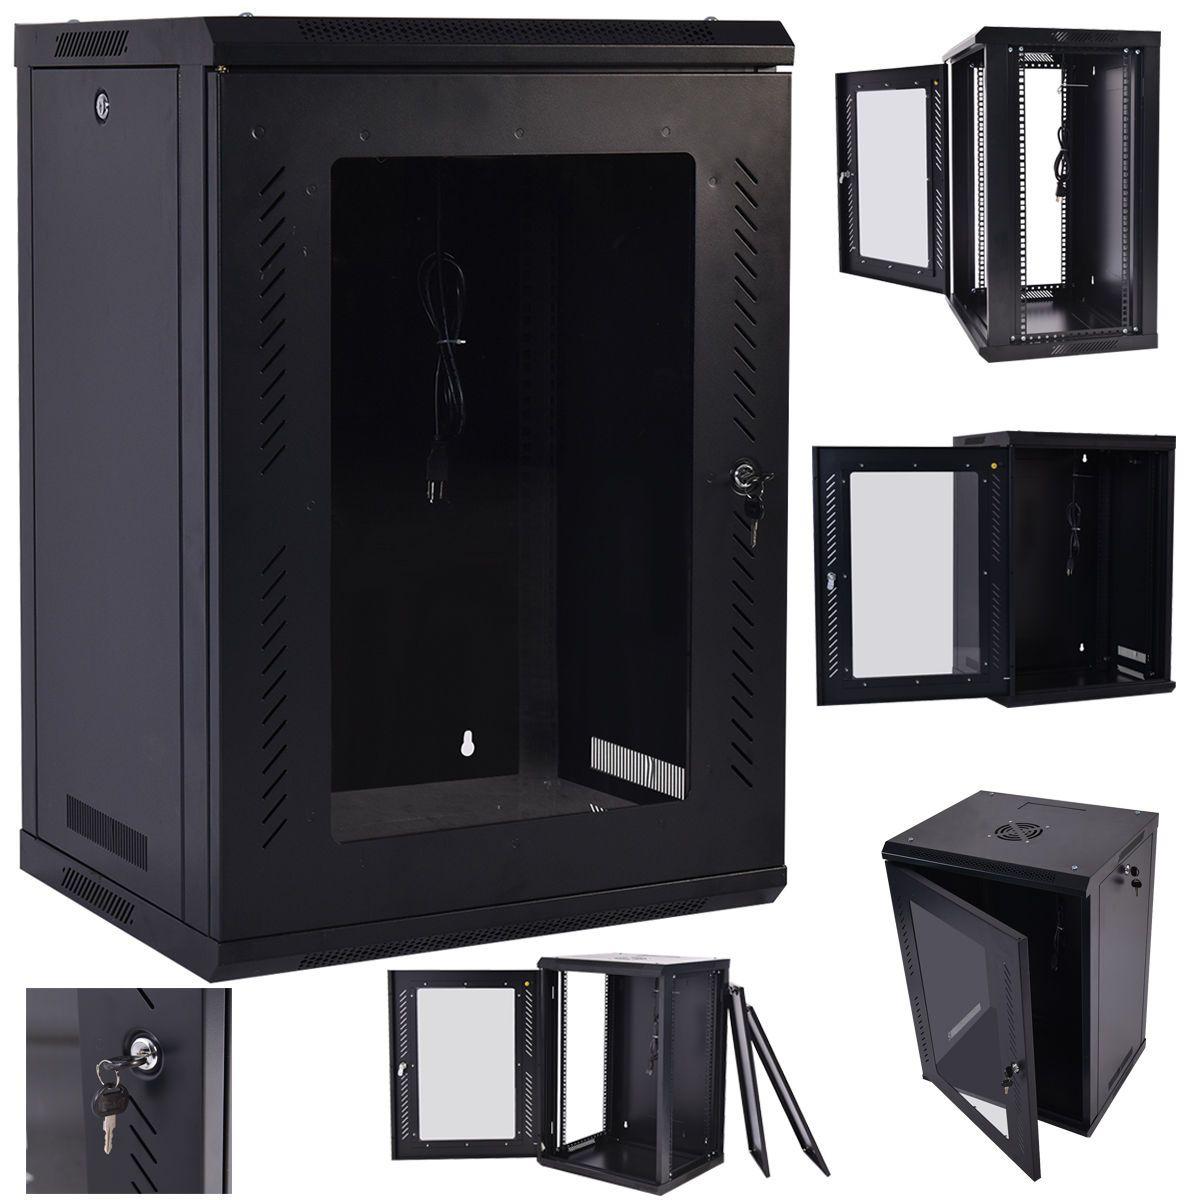 18u Wall Mount Network Server Data Cabinet Enclosure Rack Glass Door Lock W Fan Common Shopping Data Cabinet Update Cabinets Unique Kitchen Backsplash